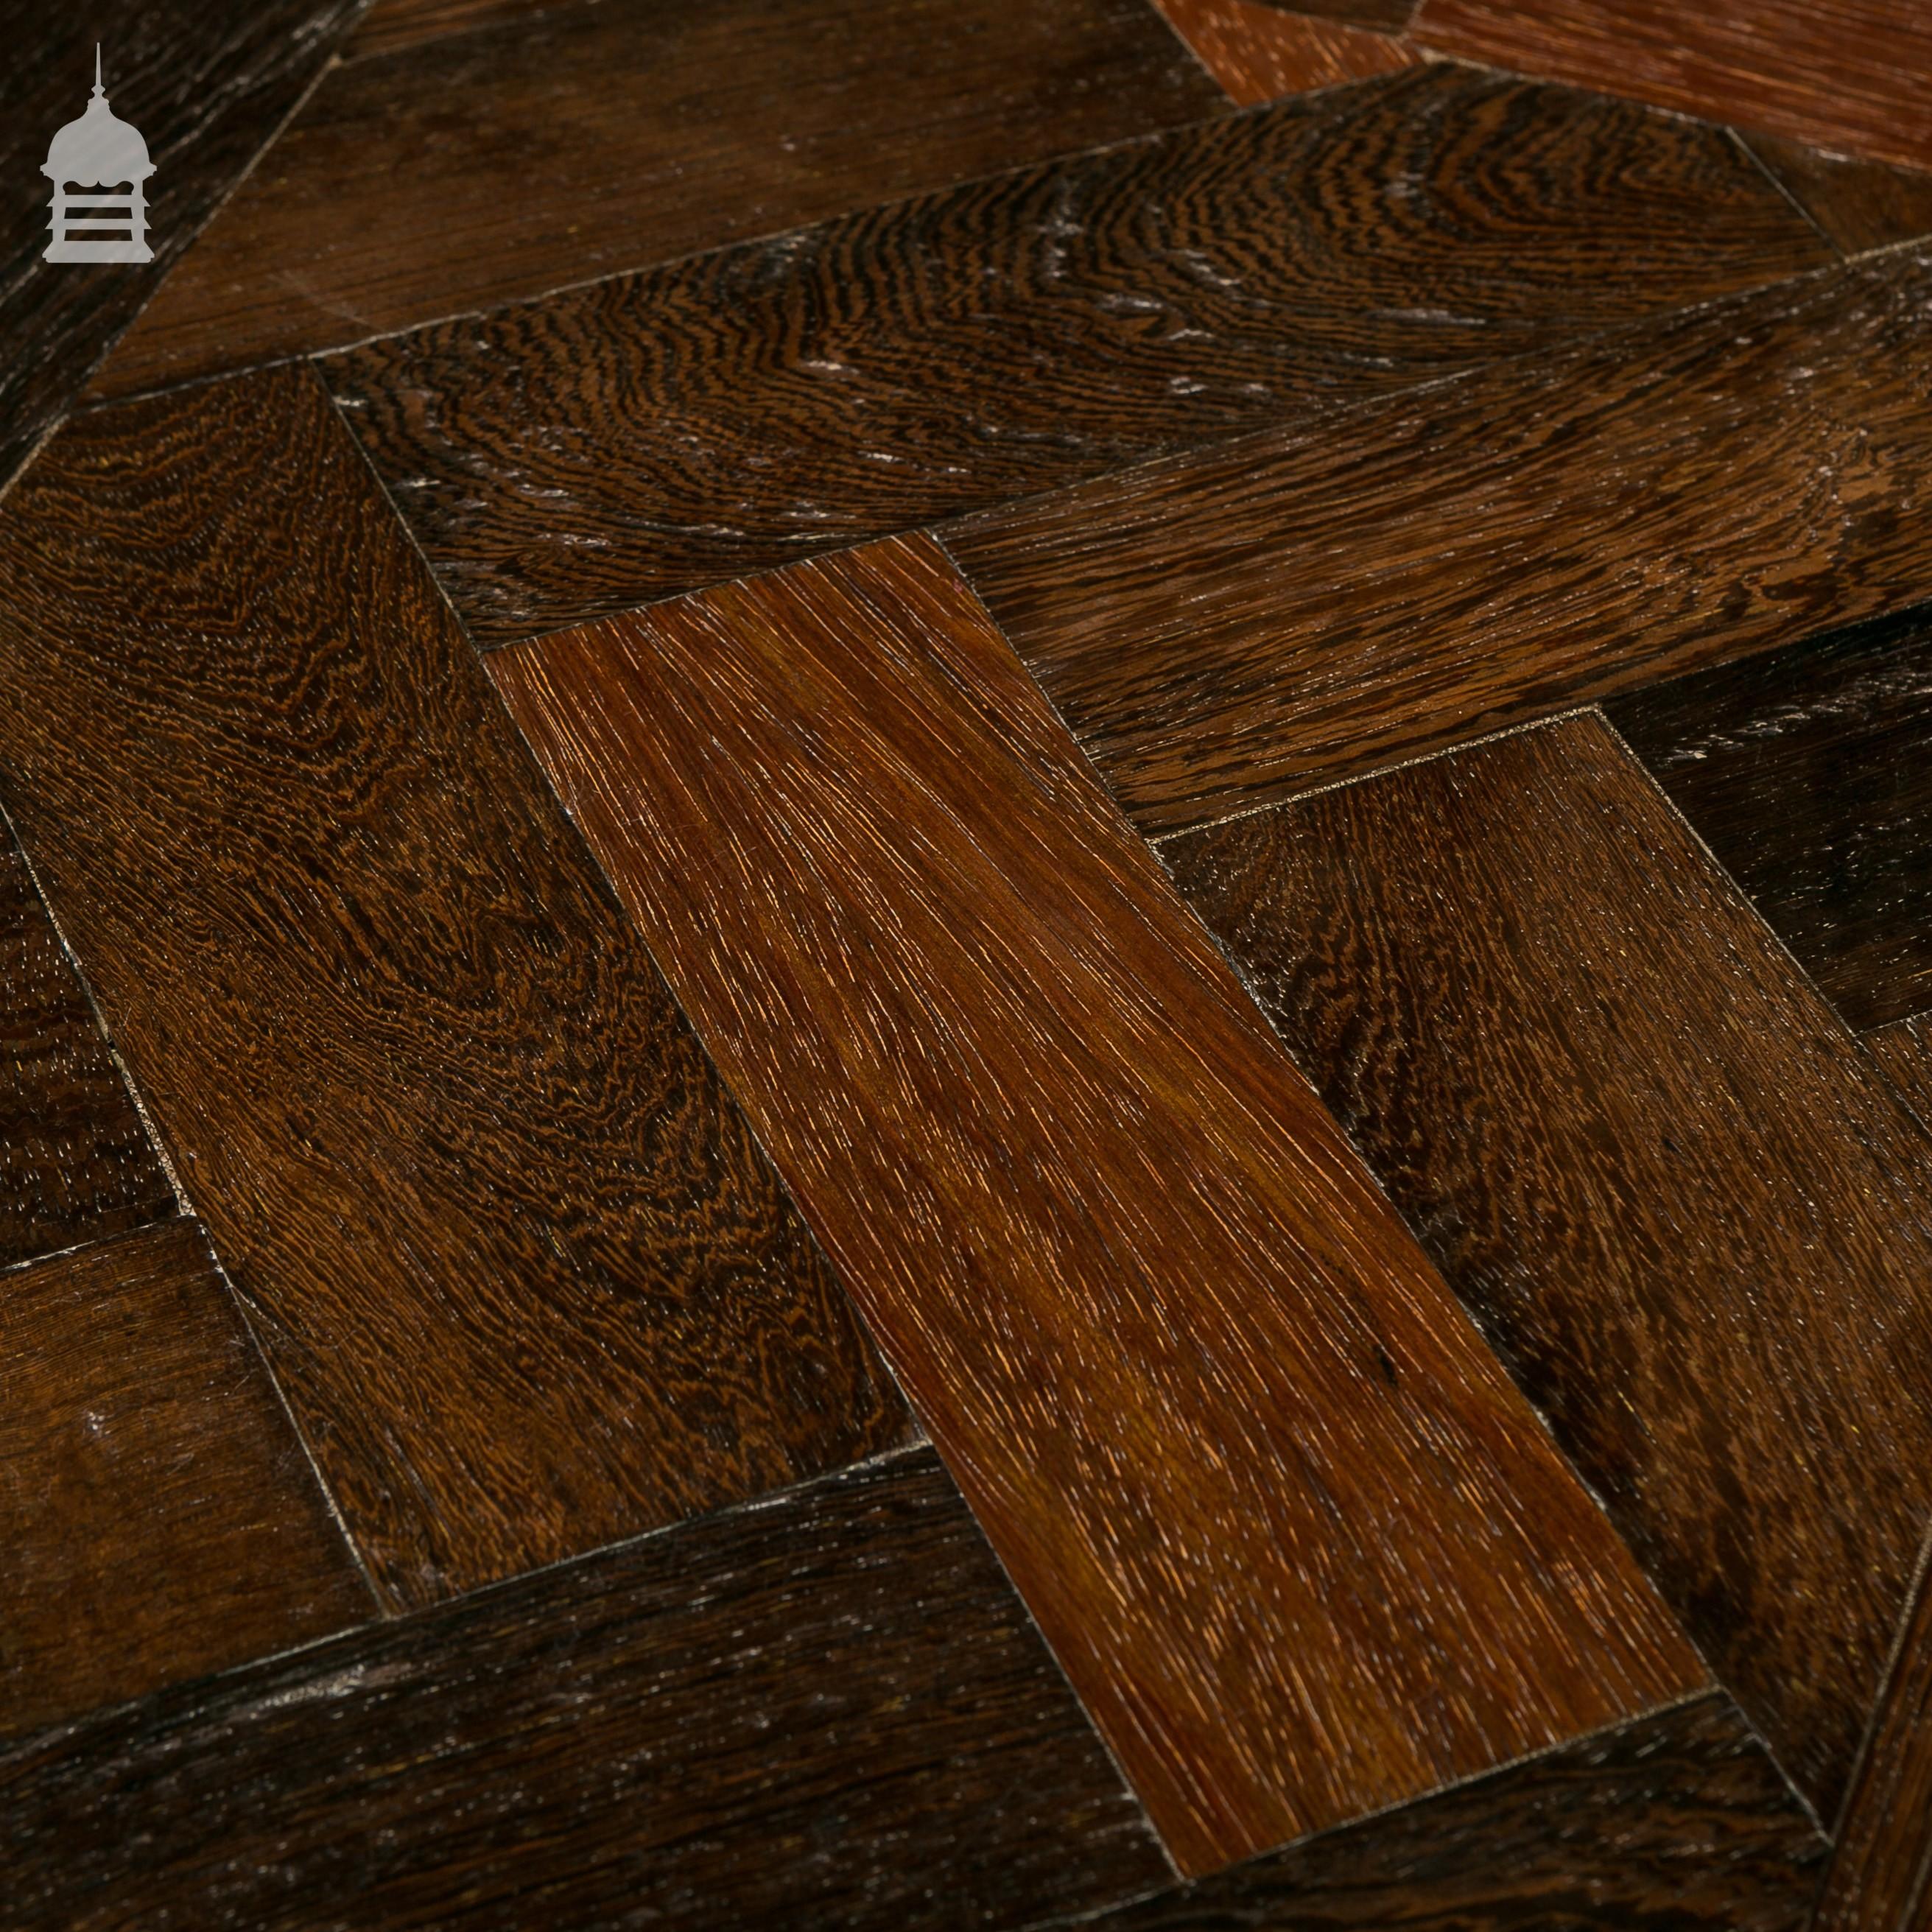 reclaimed wenge parquet block flooring. Black Bedroom Furniture Sets. Home Design Ideas